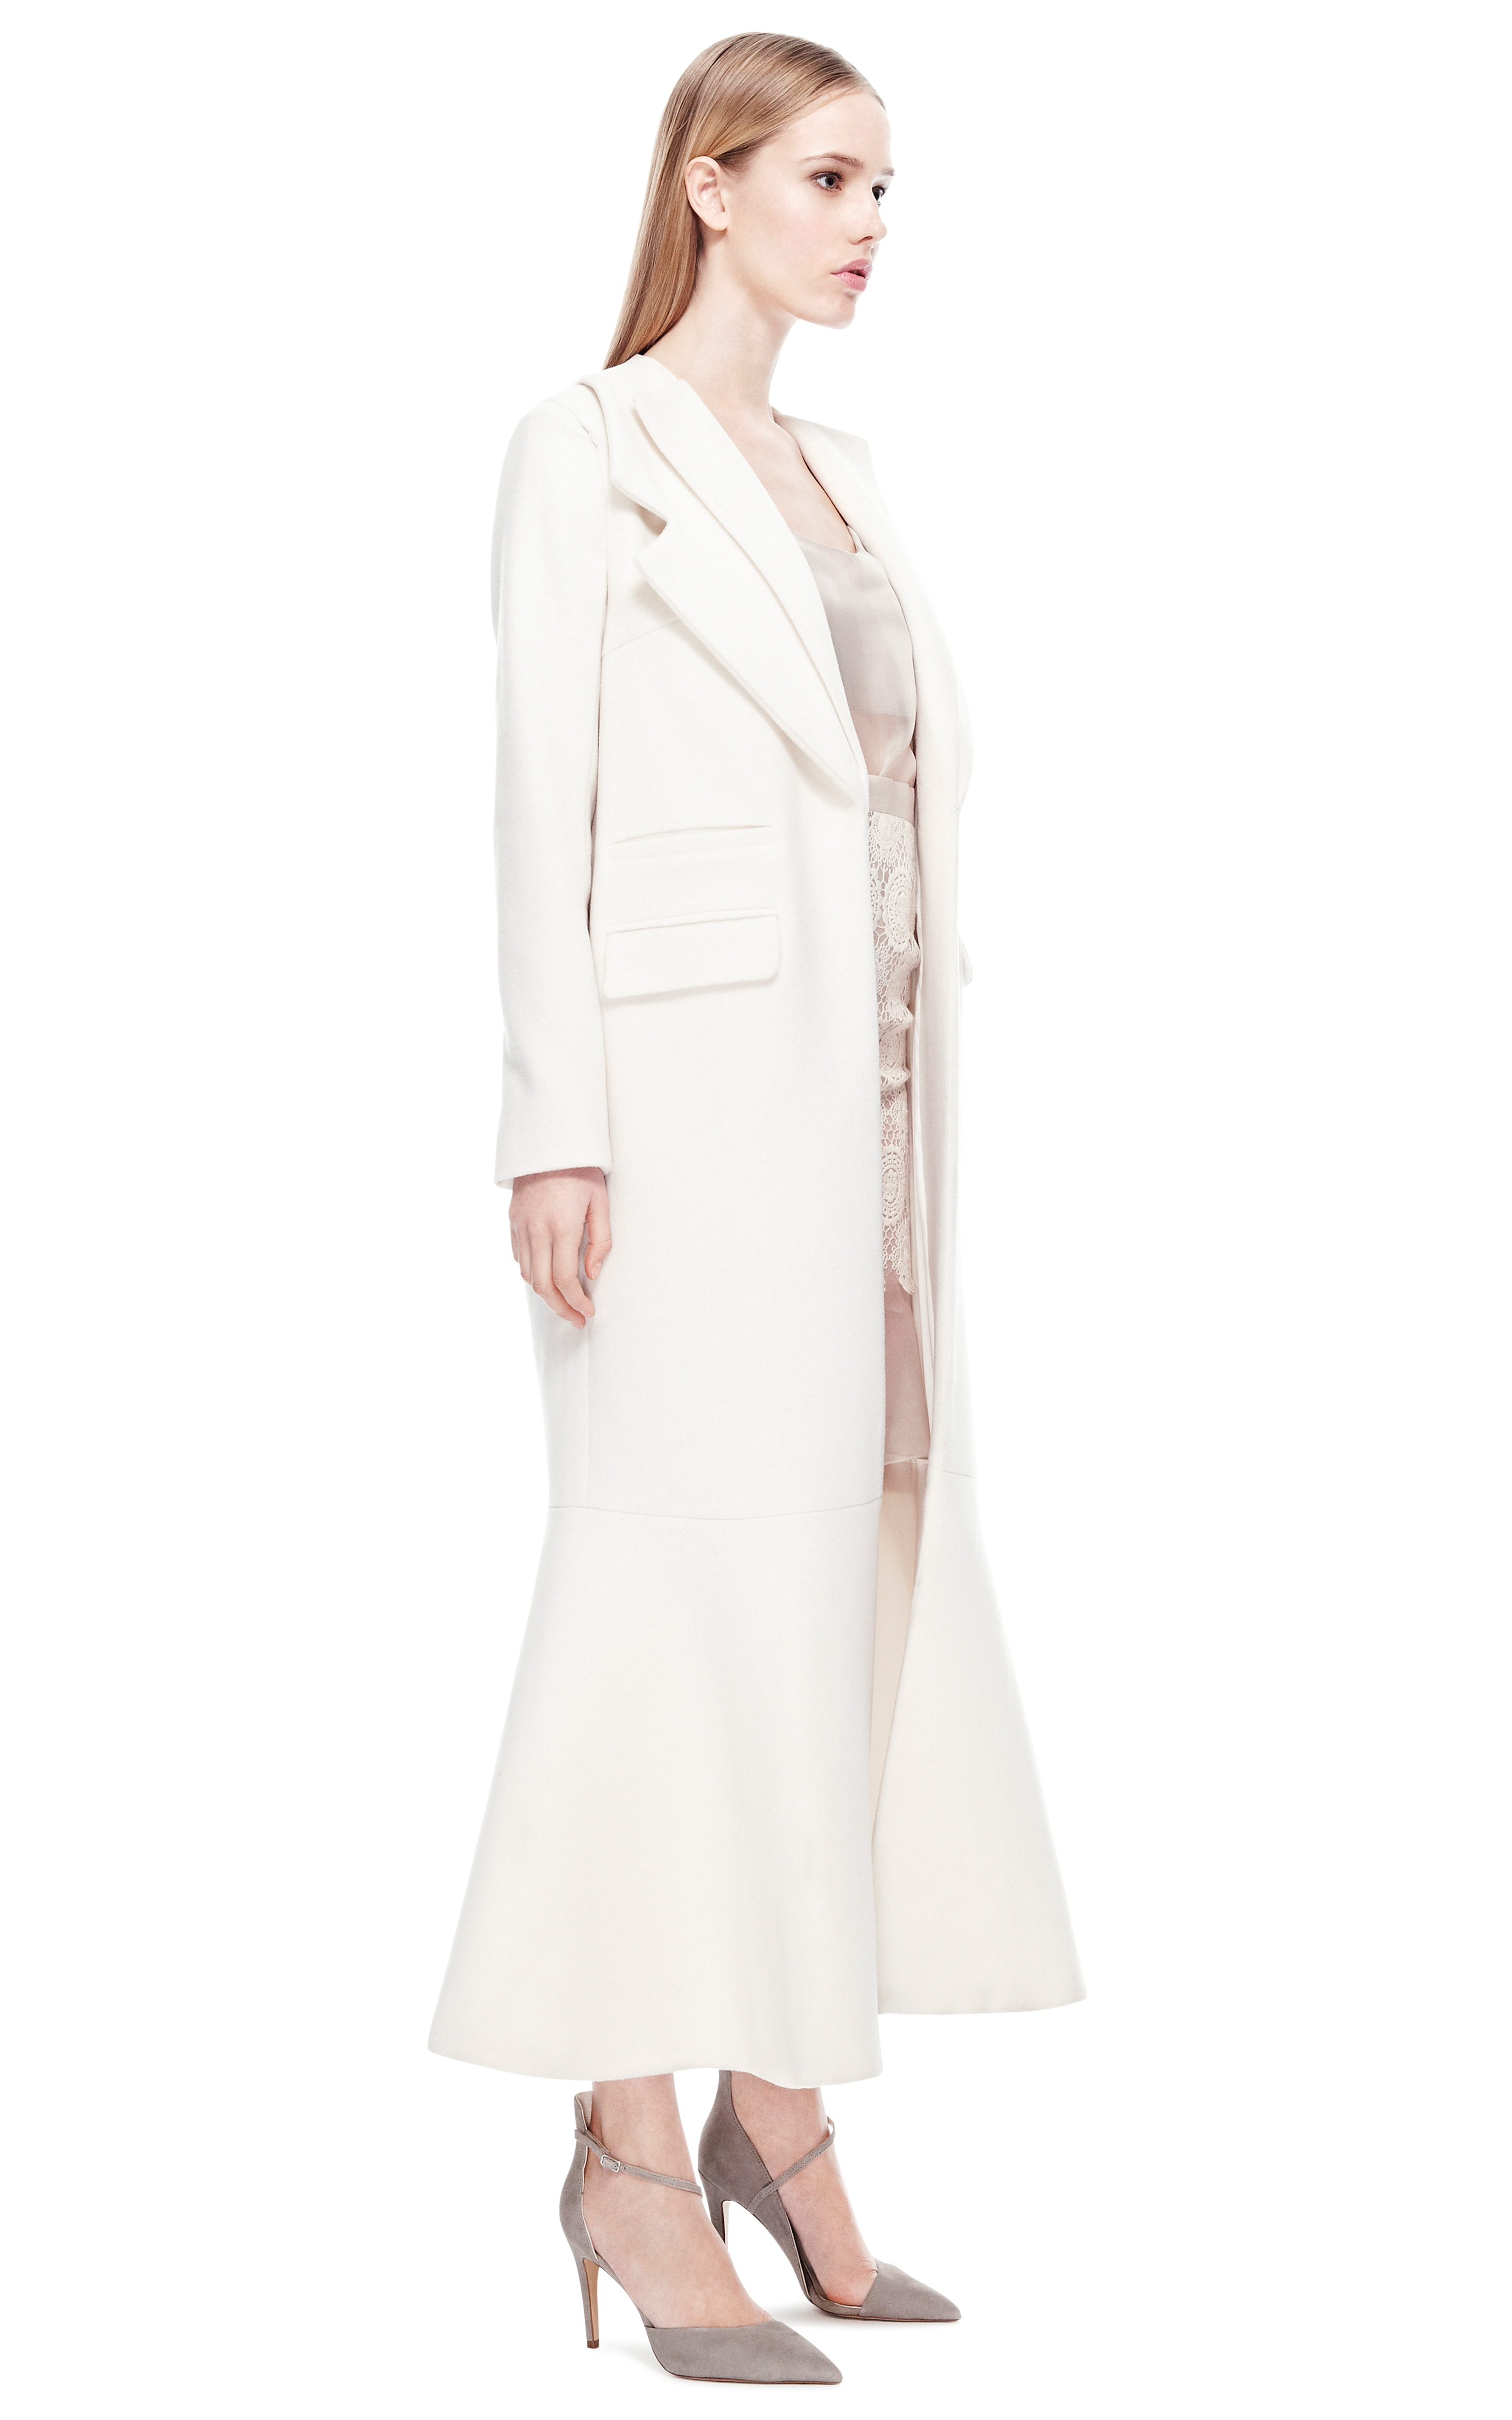 Ruban White Long Coat In White Lyst